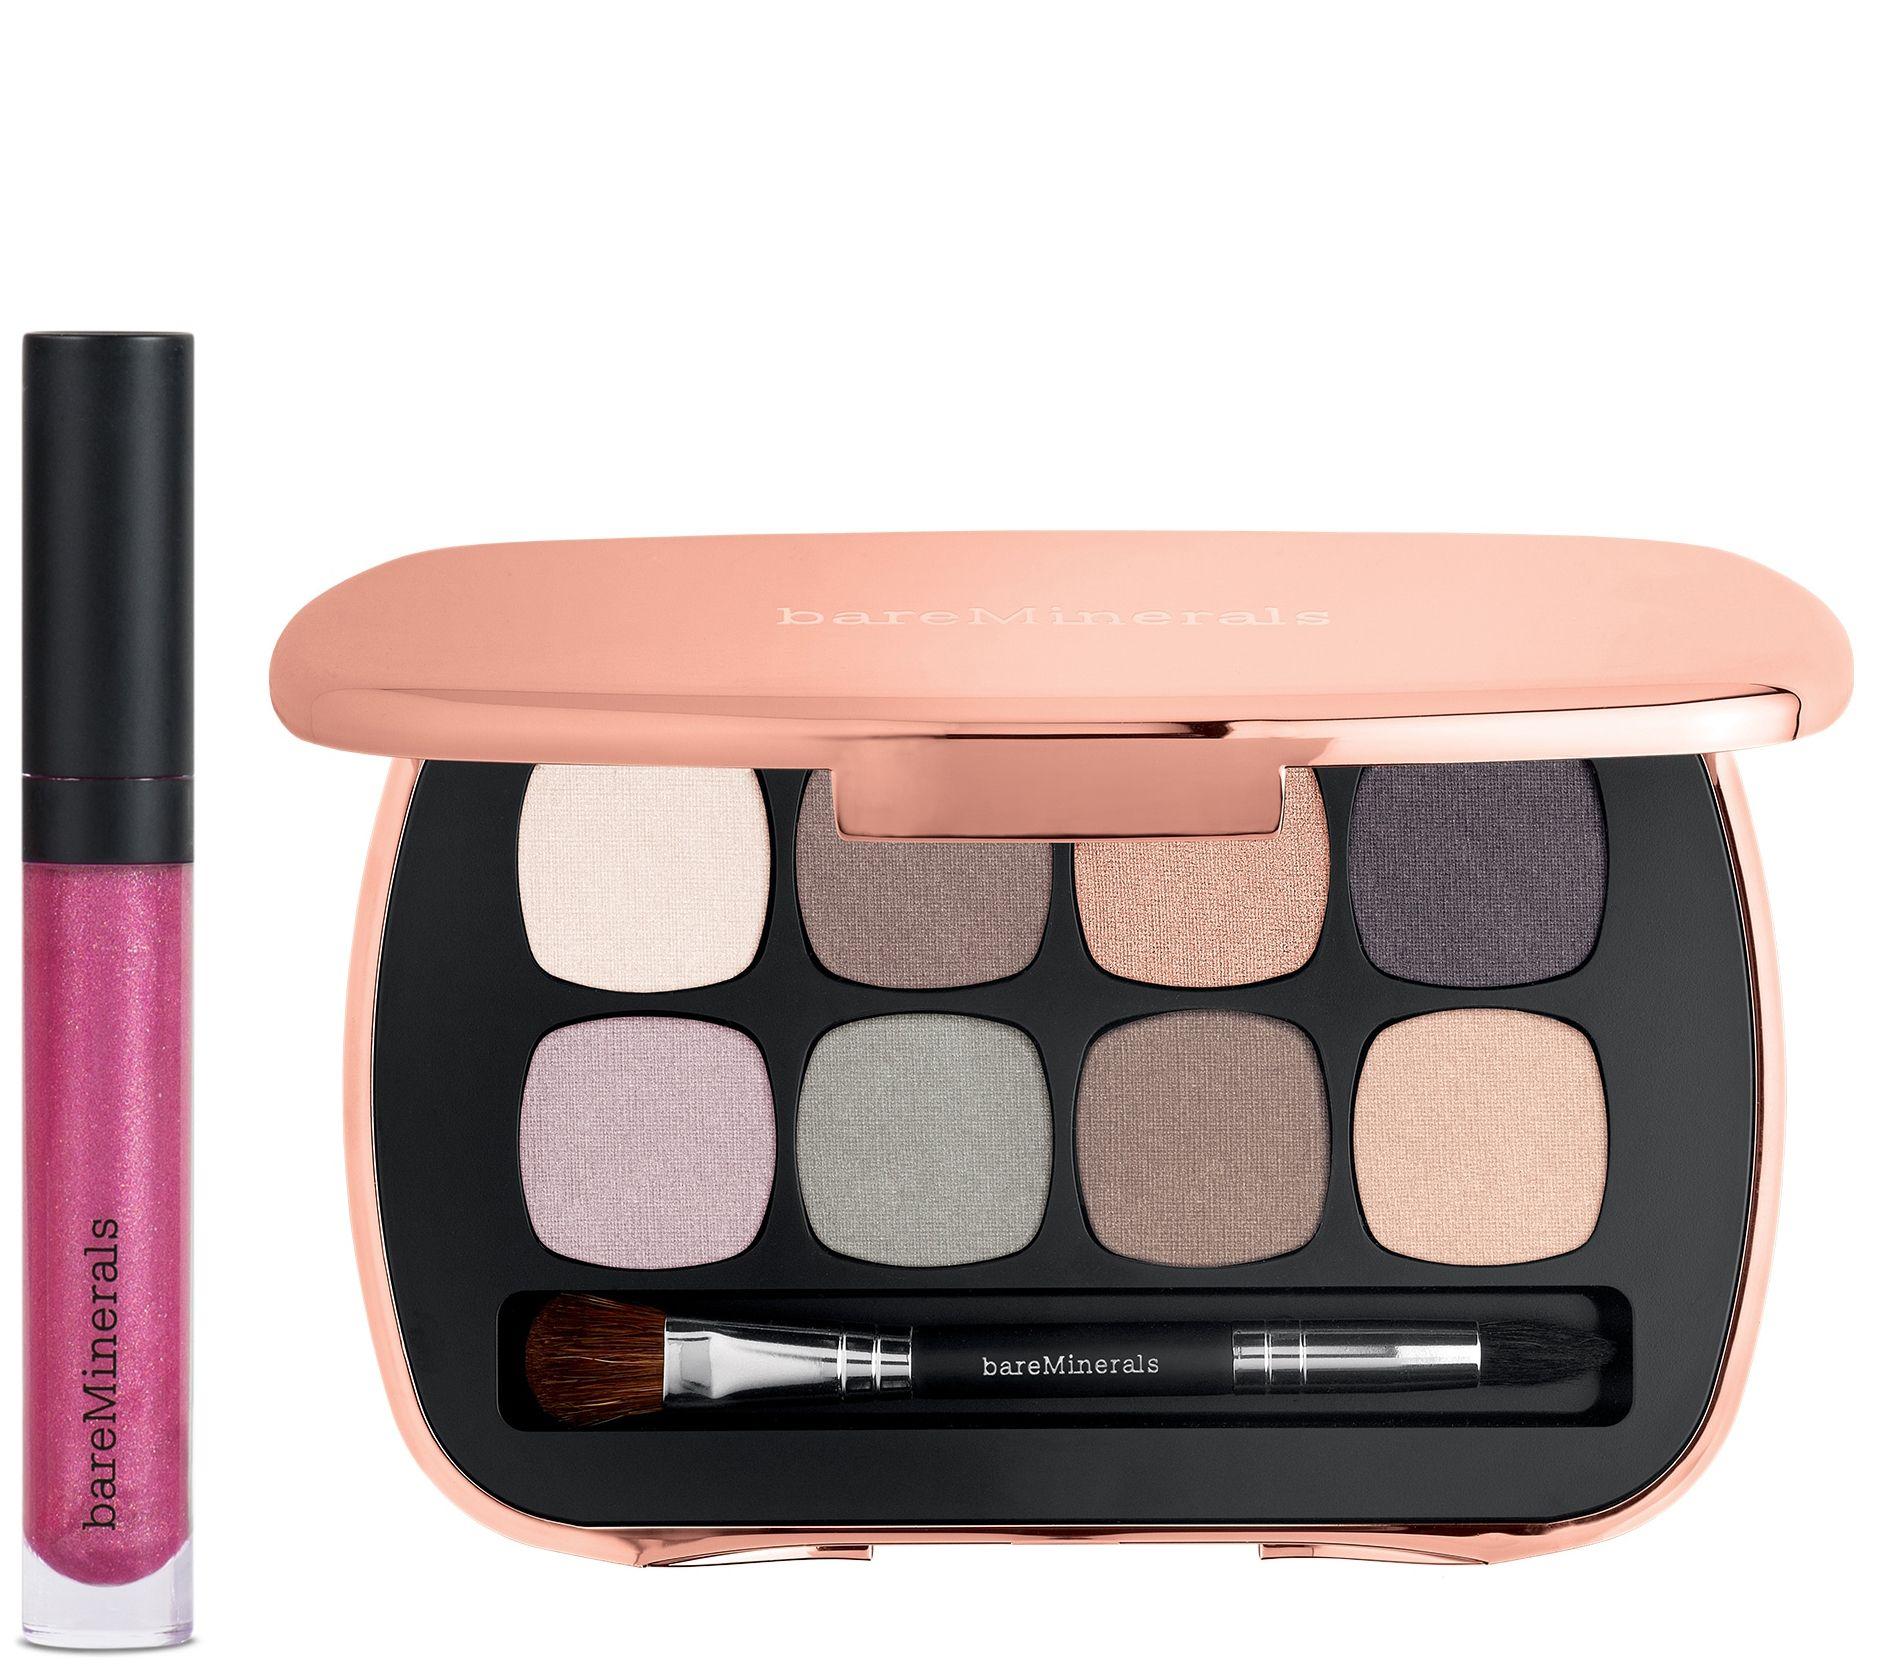 Bareminerals Eye Shadow Palette And Lip Gloss Qvc Com